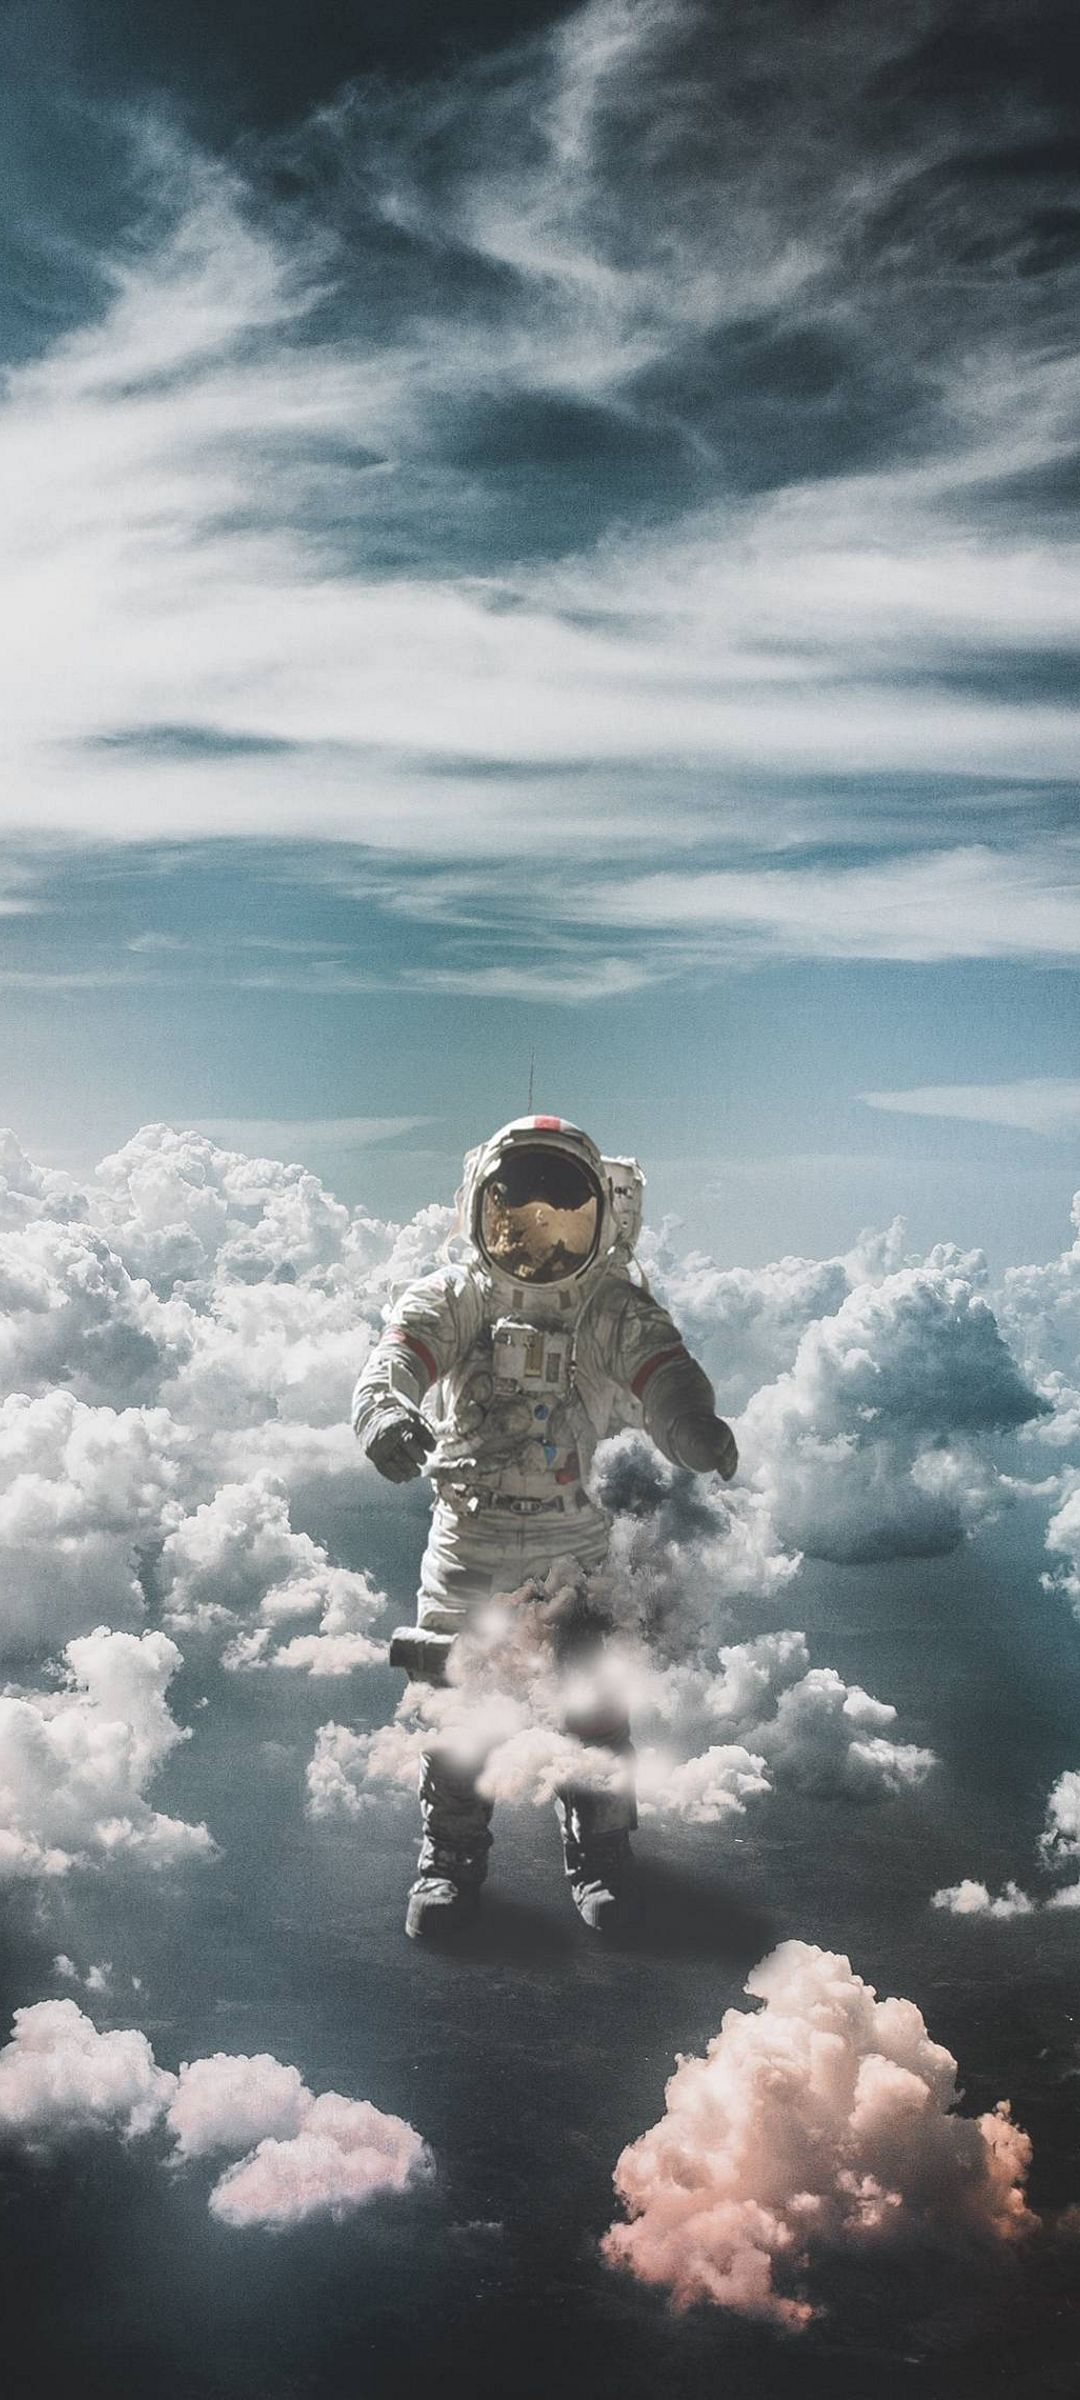 Astronaut Wallpaper Iphone X Astronaut Suit Space Clouds 1080x2400